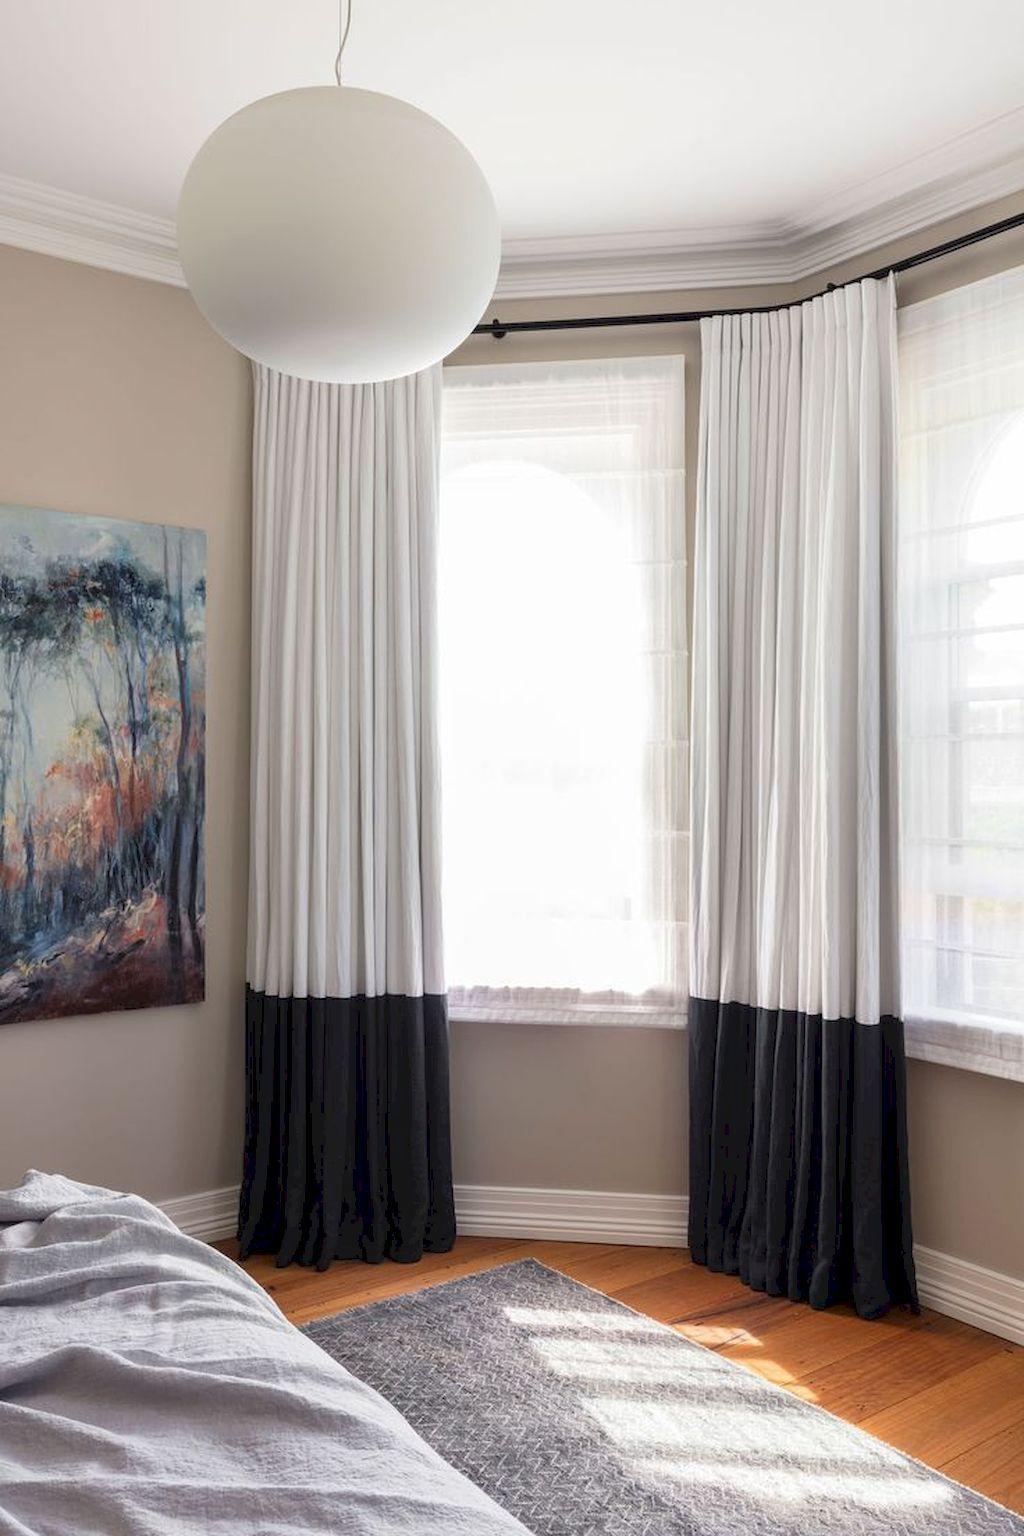 40 Creative And Inspiring Home Windows Design Ideas Buildecor Co Window Treatments Living Room Modern Window Coverings Master Bedroom Window Treatments